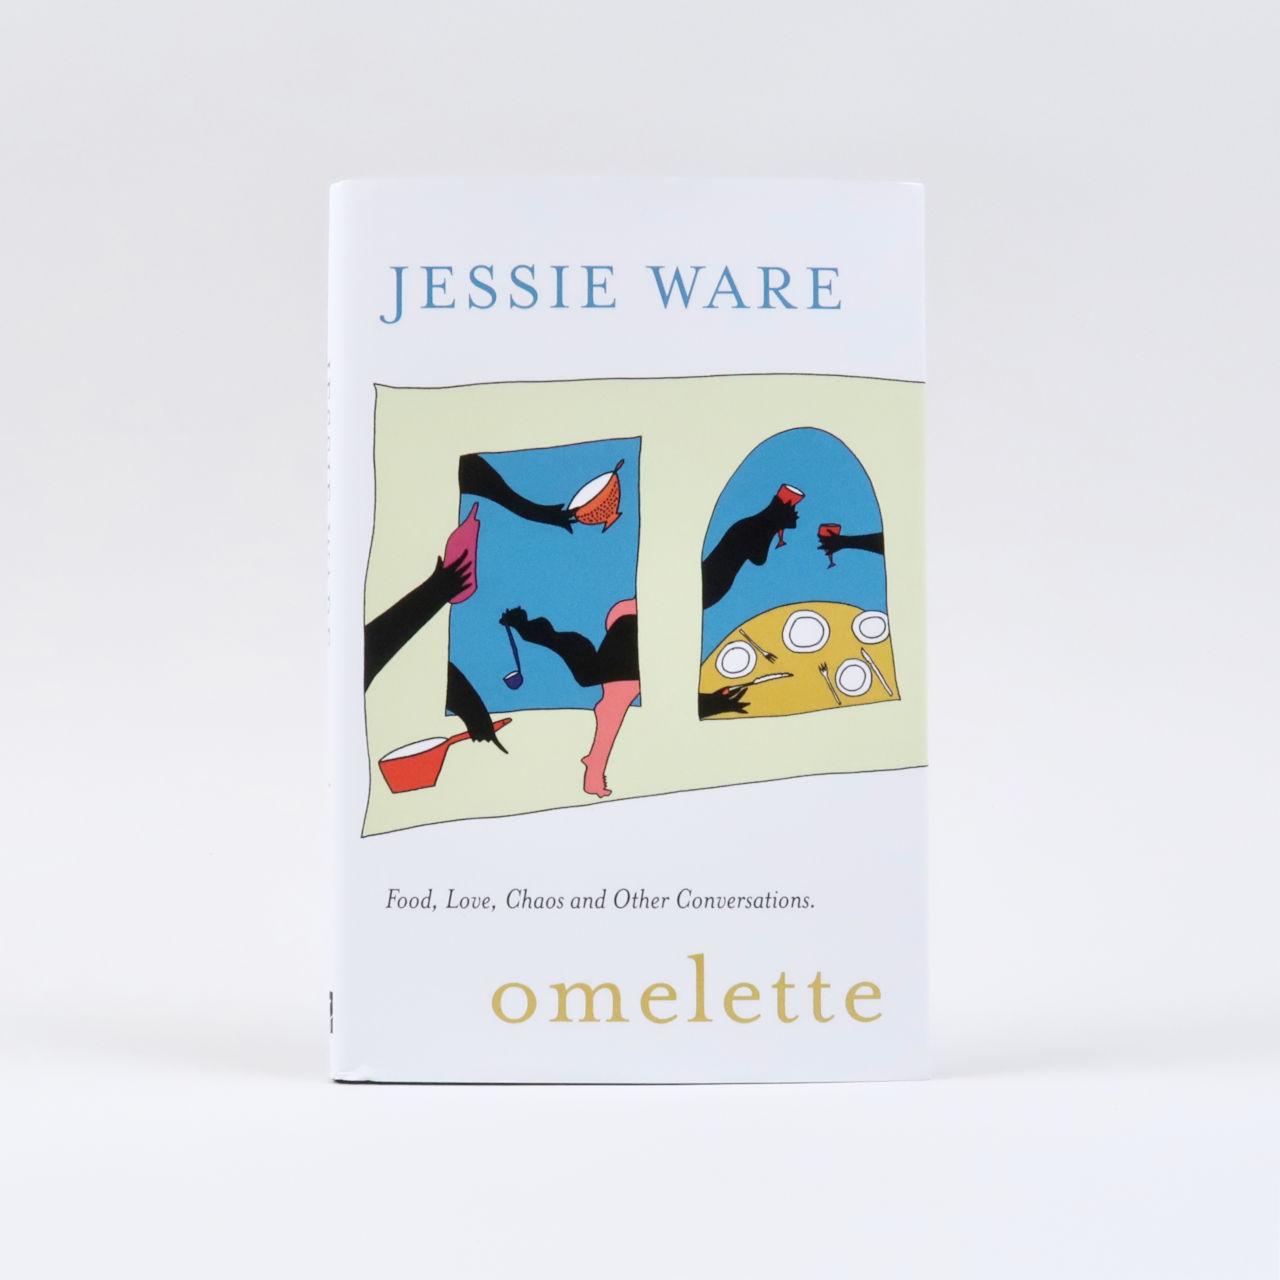 Omelette - Jessie Ware